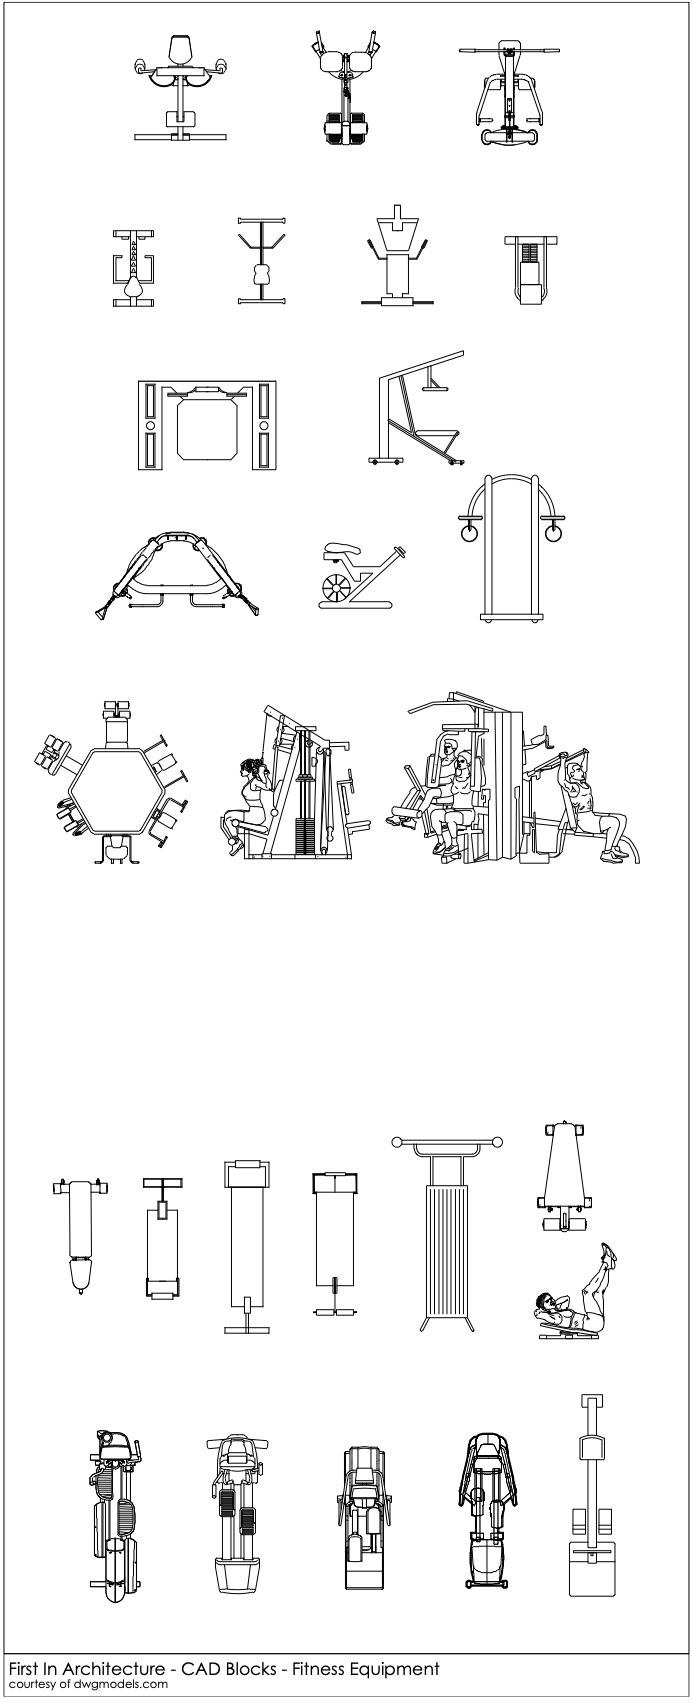 FIA CAD Blocks Fitness Equipment 2